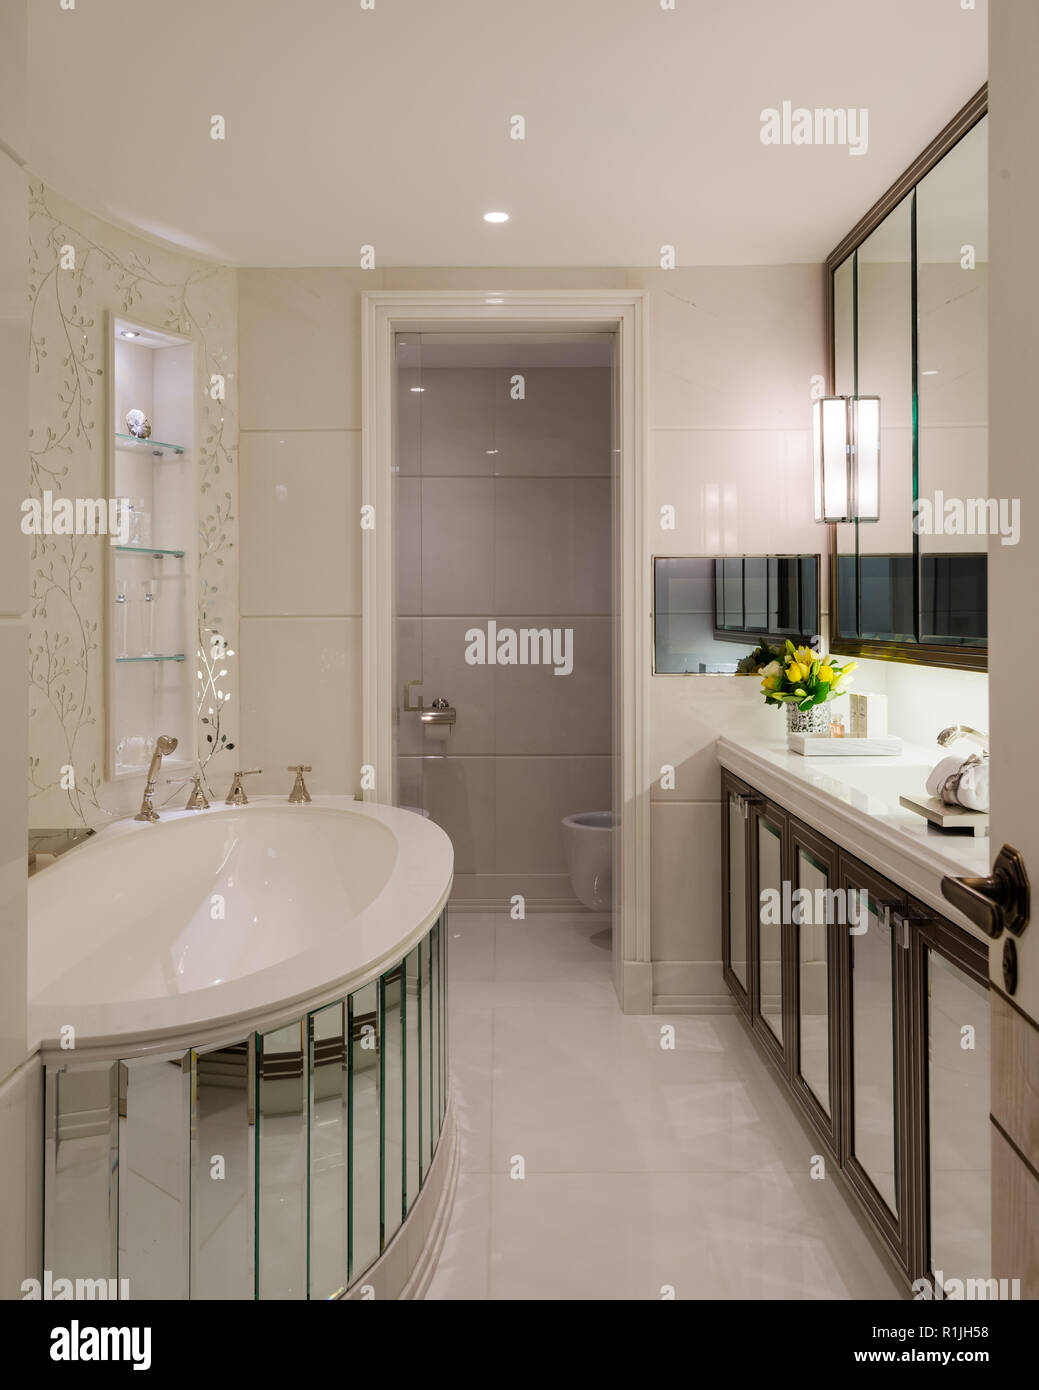 Mirrored bathtub in white bathroom - Stock Image